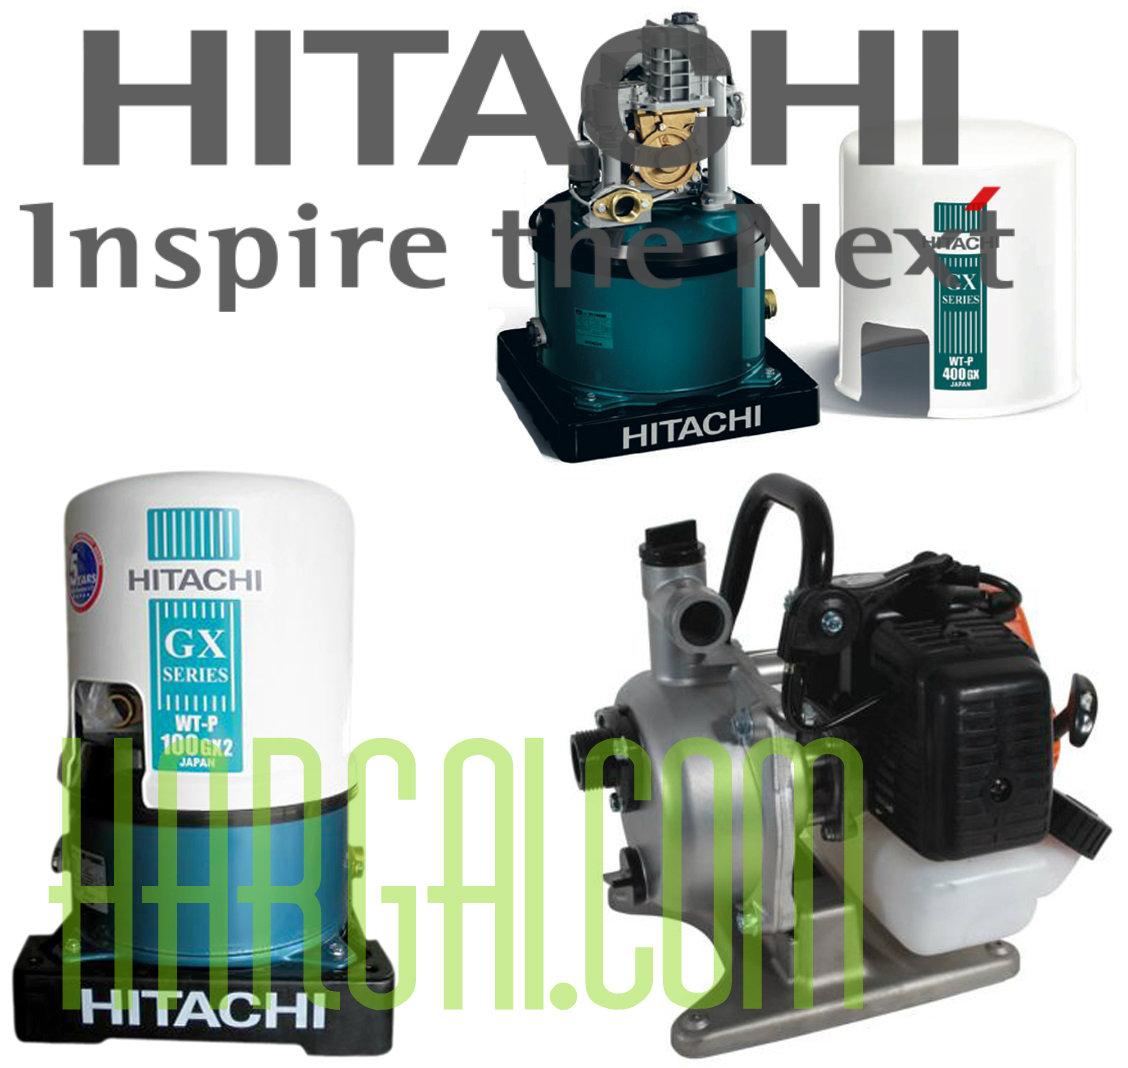 Daftar Harga Pompa Air Hitachi Terbaru Agustus September Oktober November Desember 2016